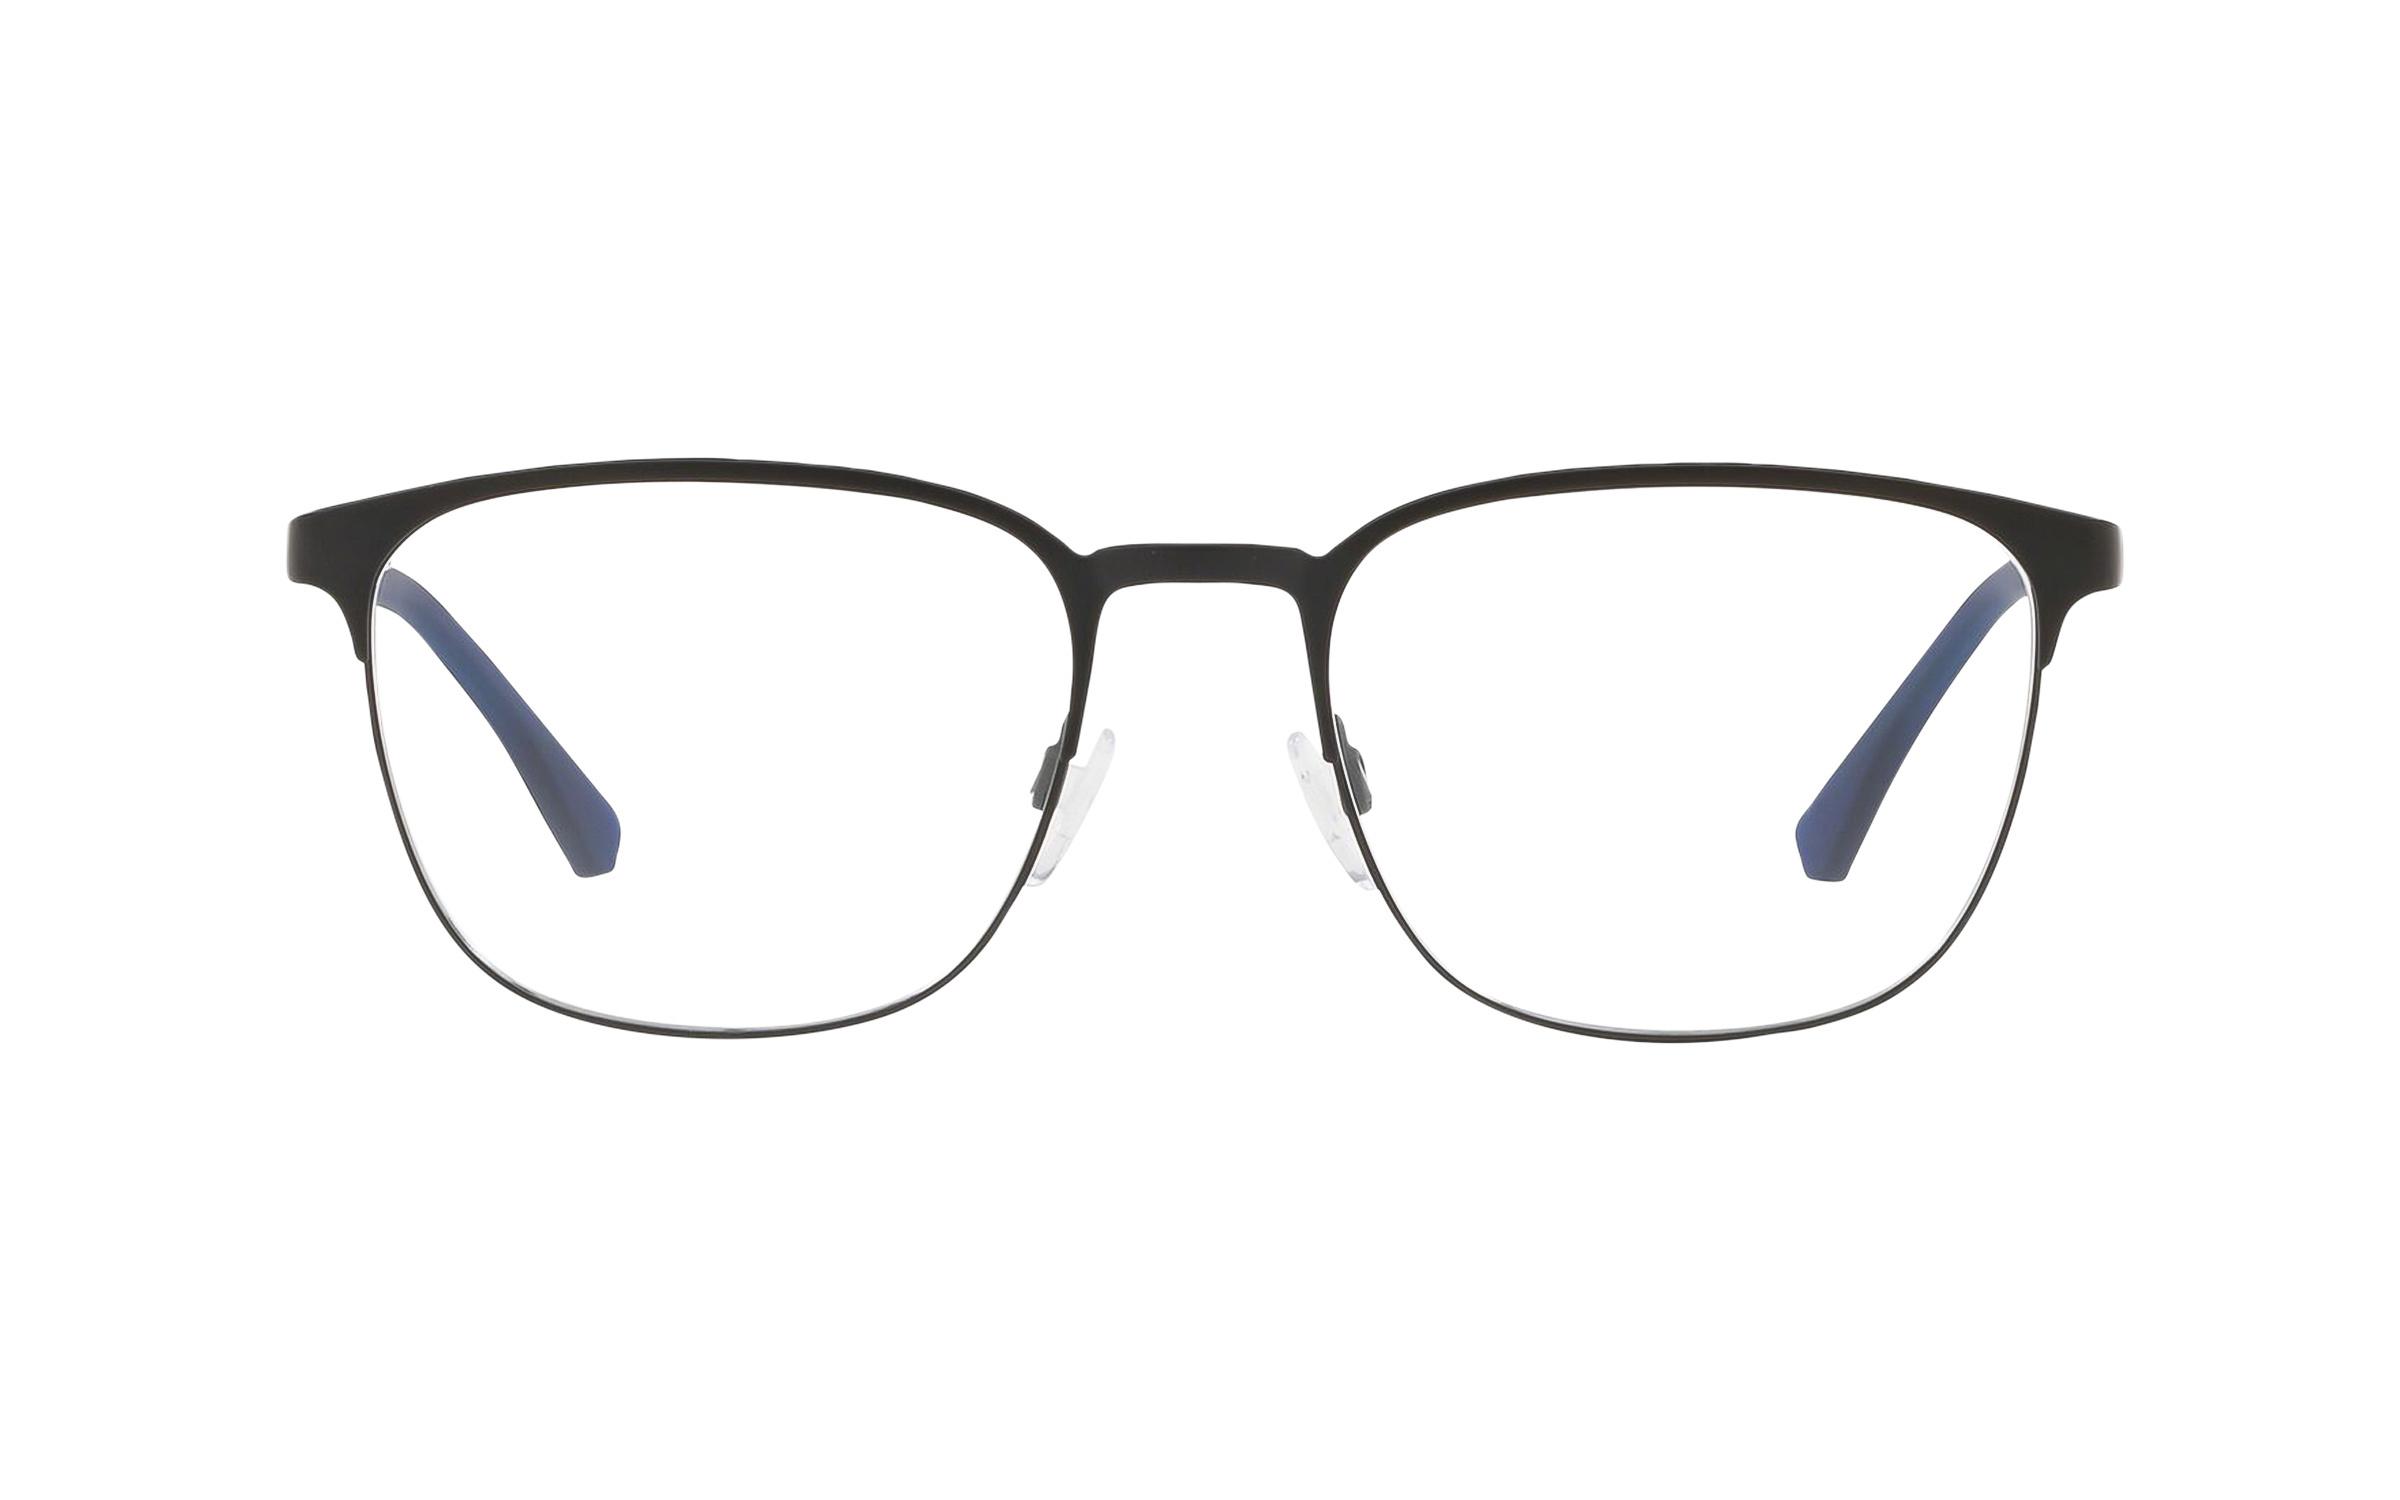 Luxottica Emporio Armani EA1081 3001 (55) Eyeglasses and Frame in Matte Black | Plastic/Metal - Online Coastal